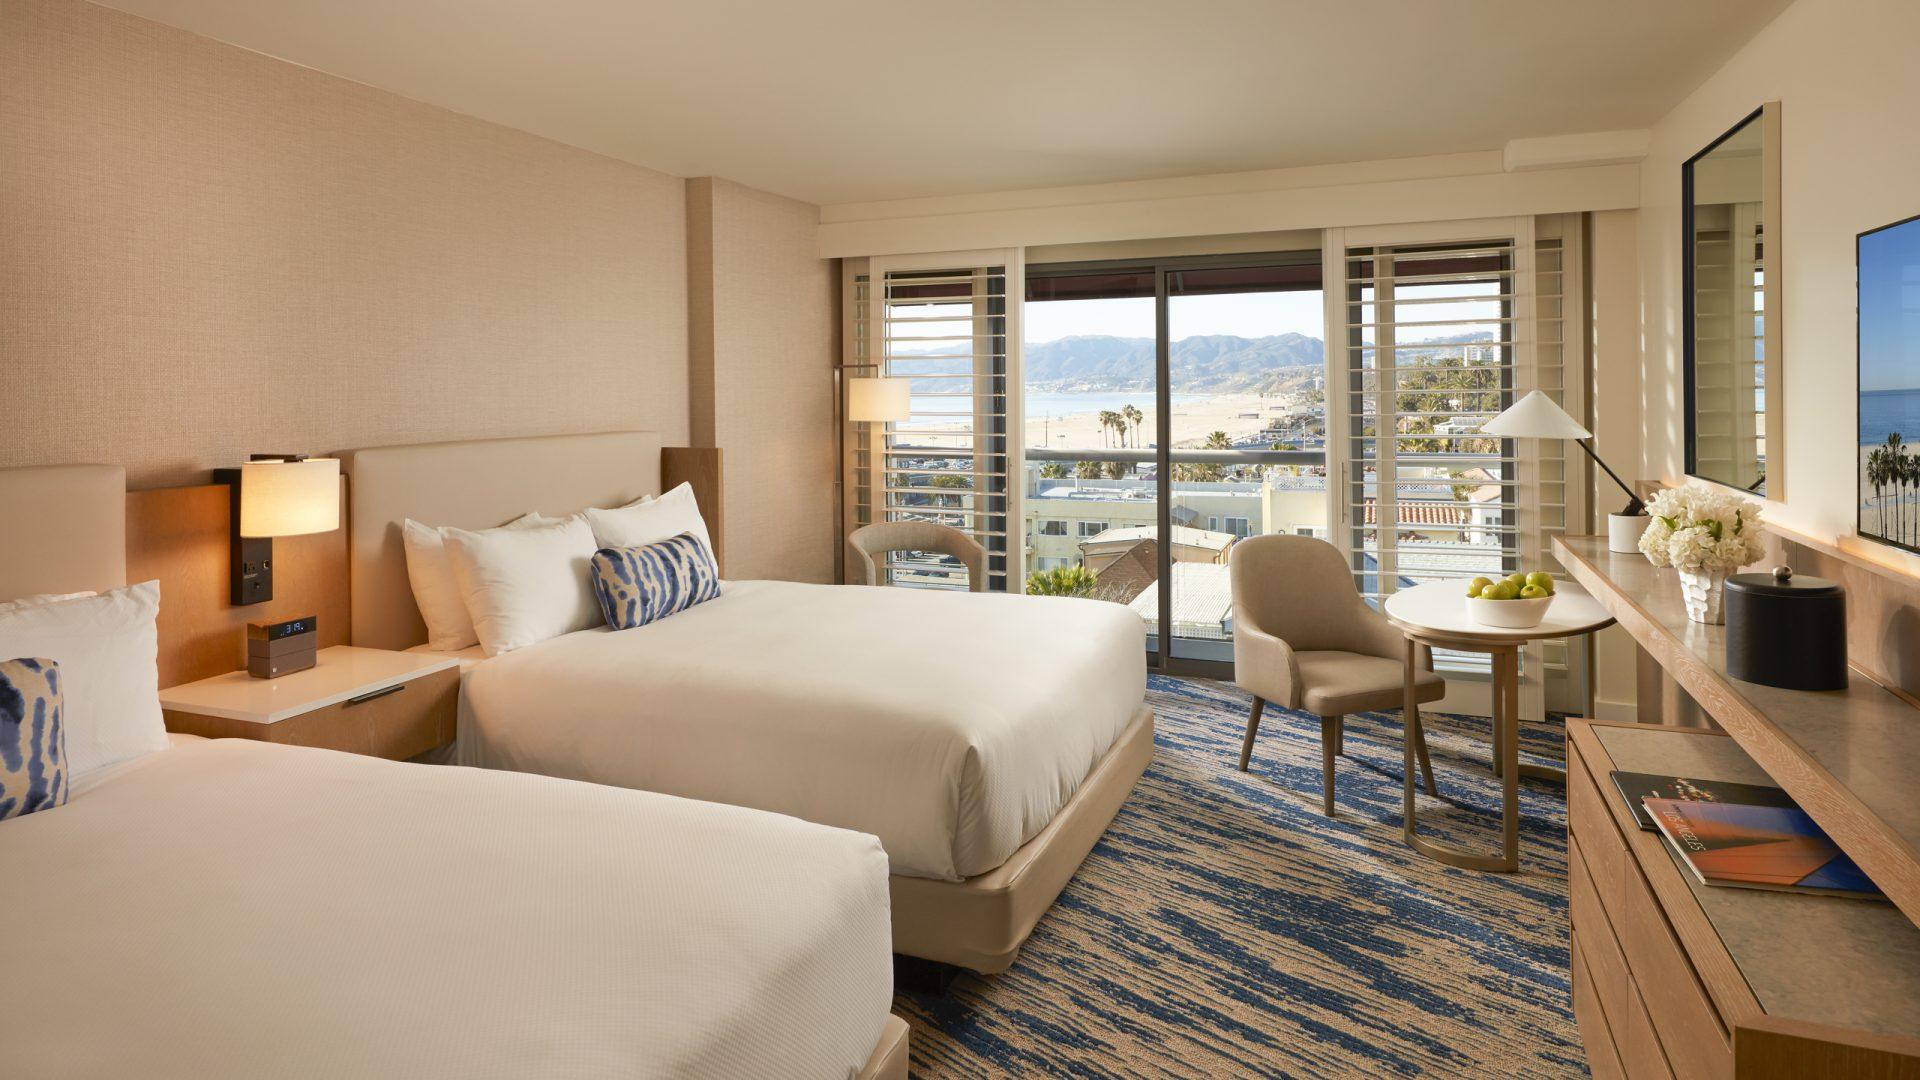 santa monica accommodations loews santa monica hotel. Black Bedroom Furniture Sets. Home Design Ideas